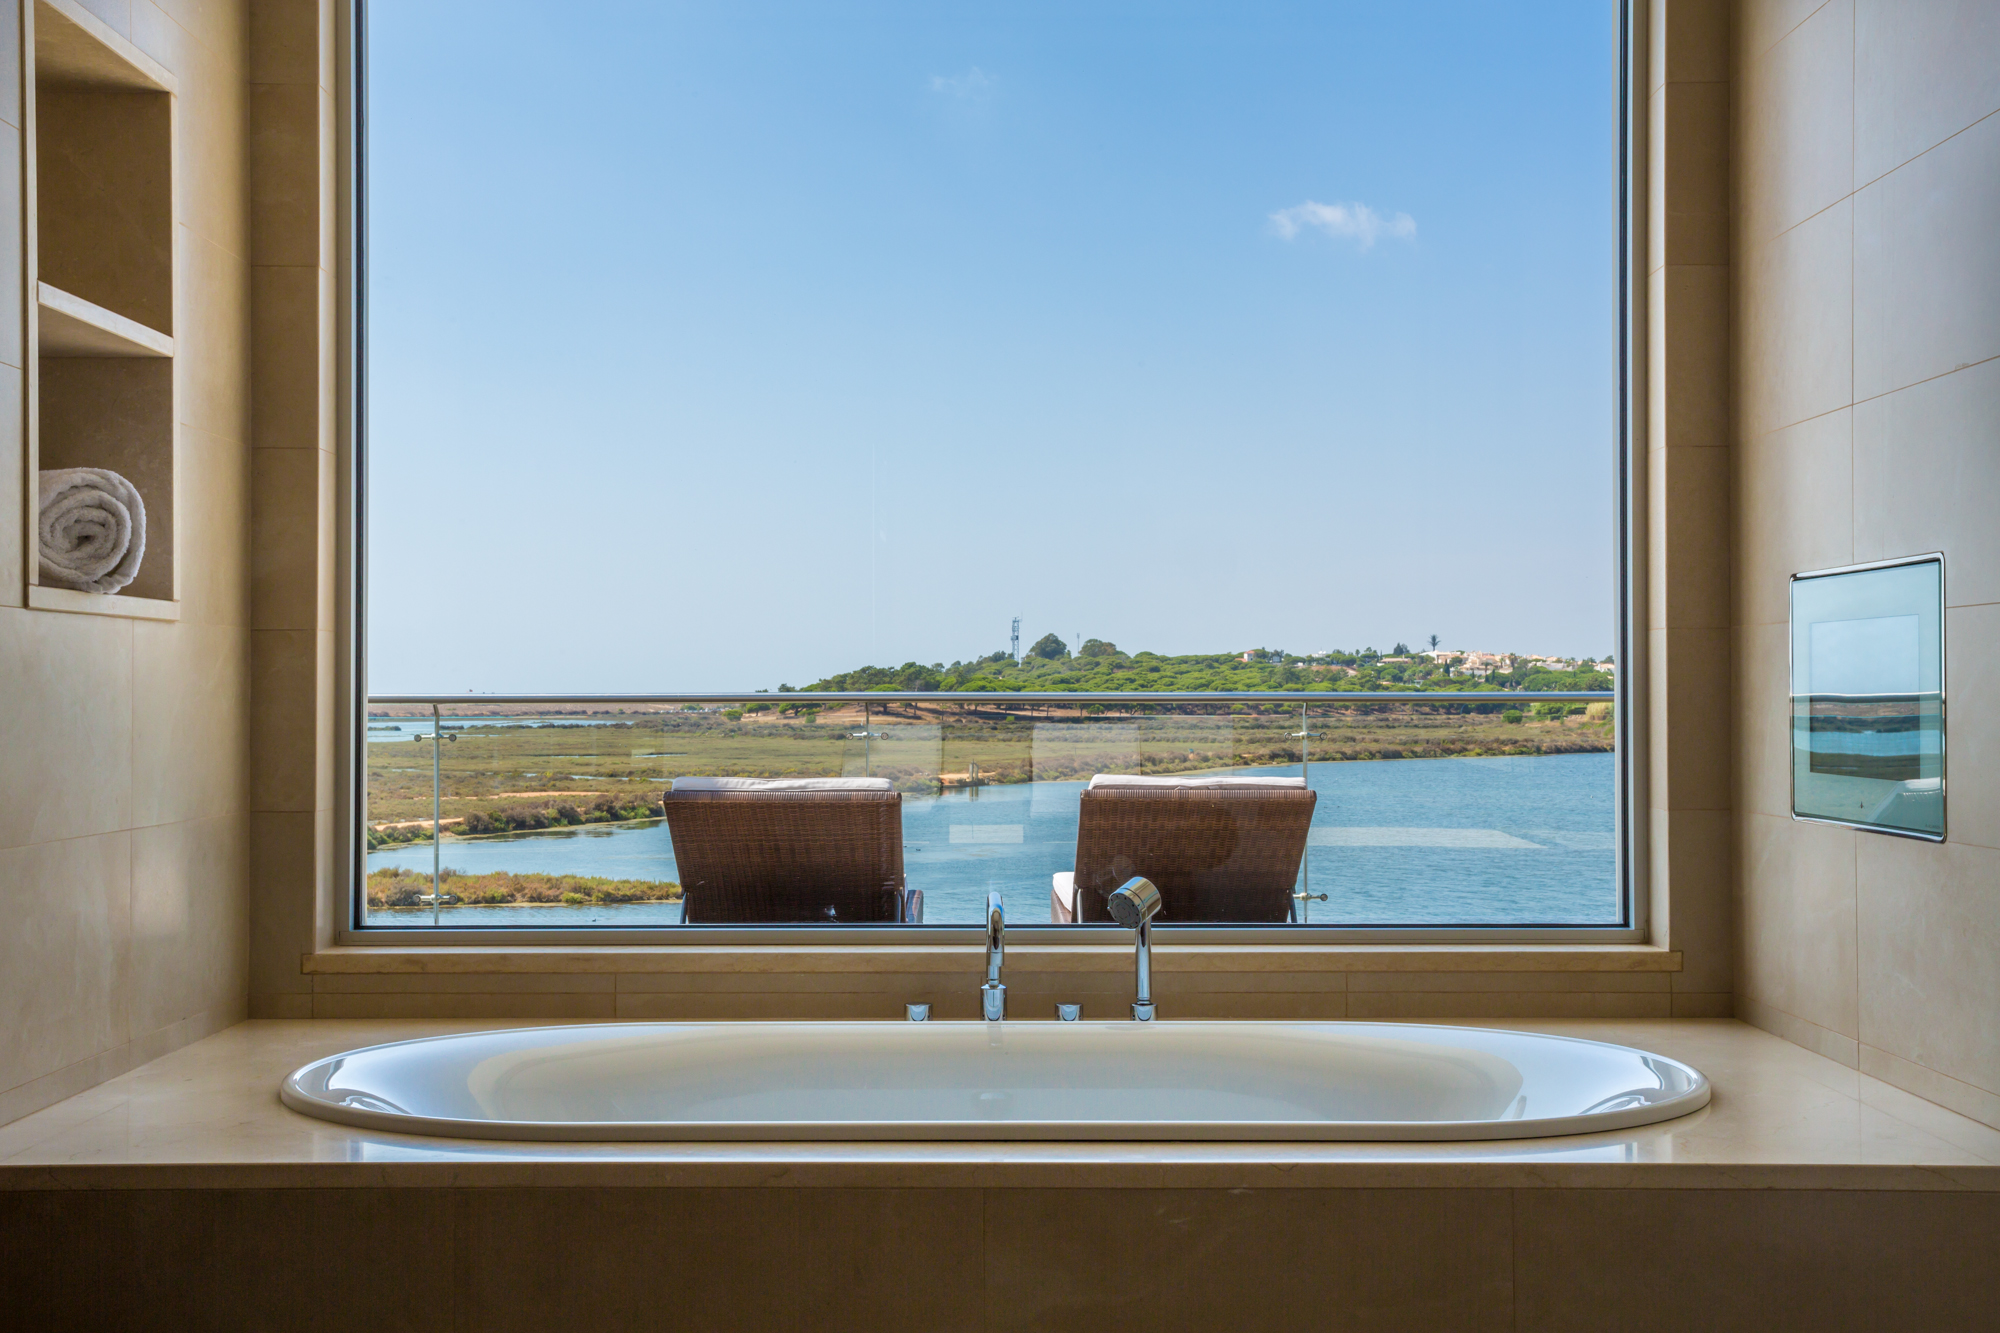 Villa Moon Sone, 5 bedroom prestige villa in Quinta do Lago, Algarve, master bathroom.jpg